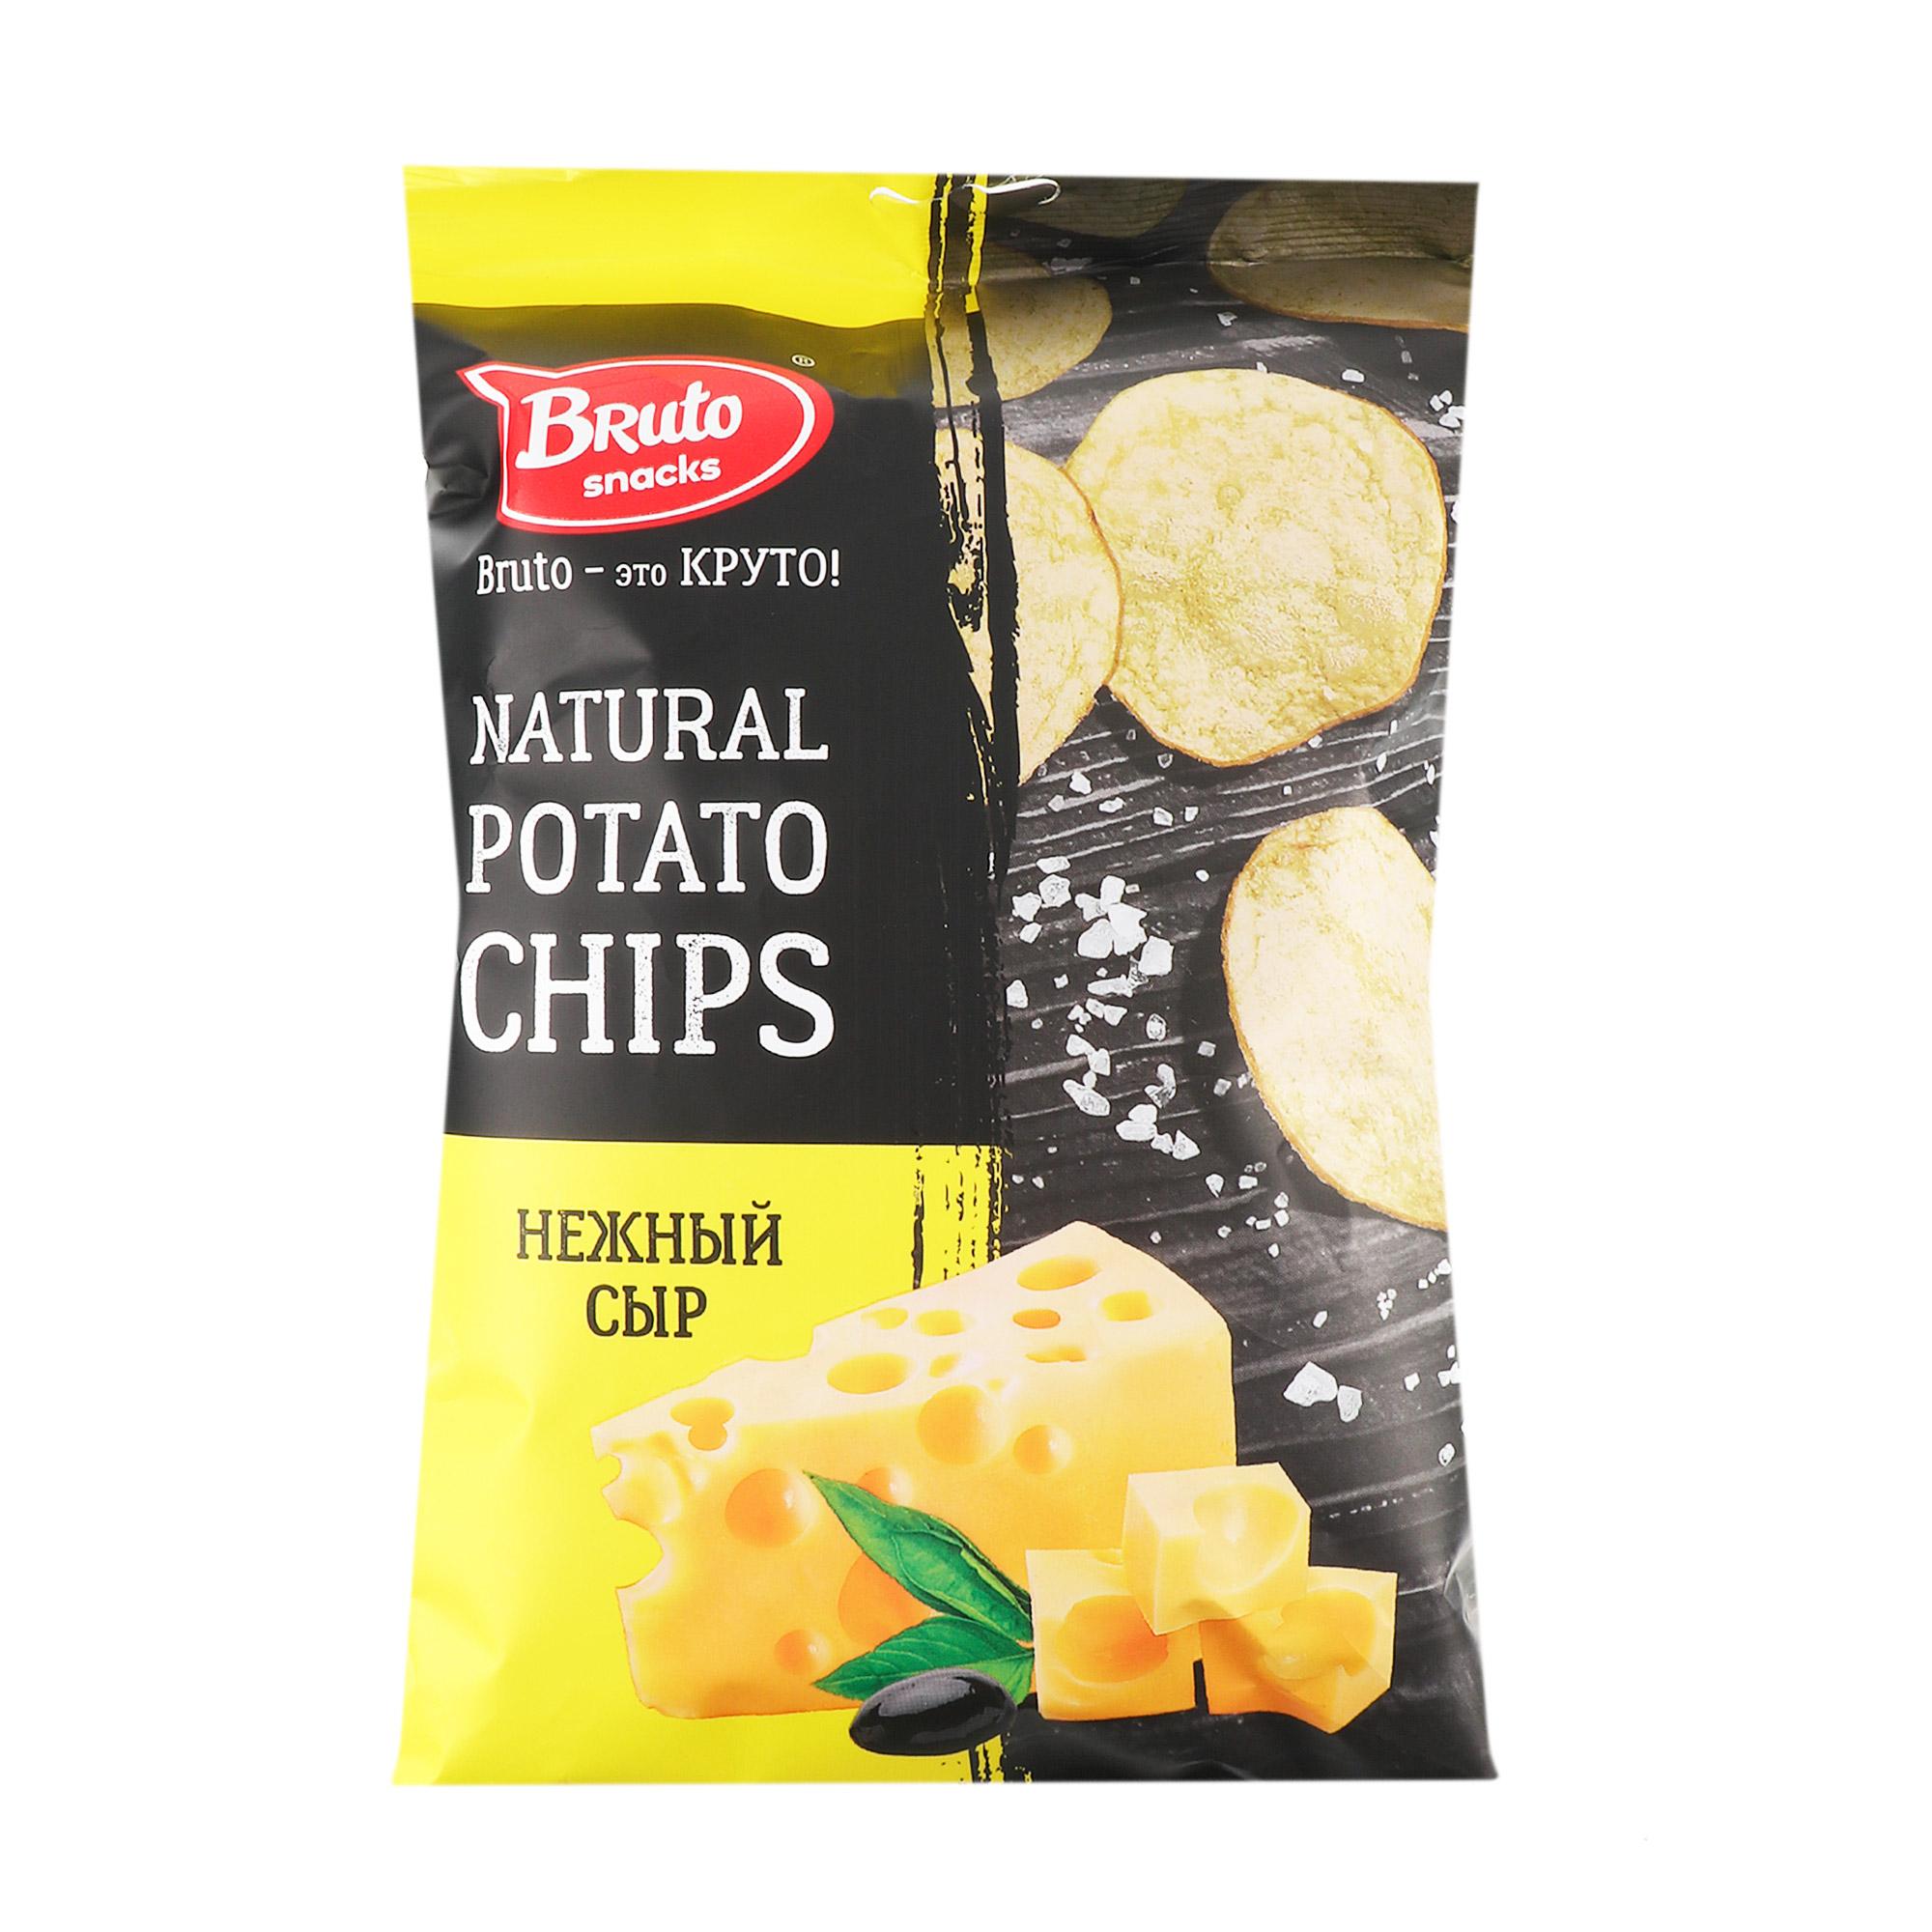 Чипсы картофельные Bruto нежный сыр 150 г чипсы bon giorno картофельные сыр дорблю 90 г